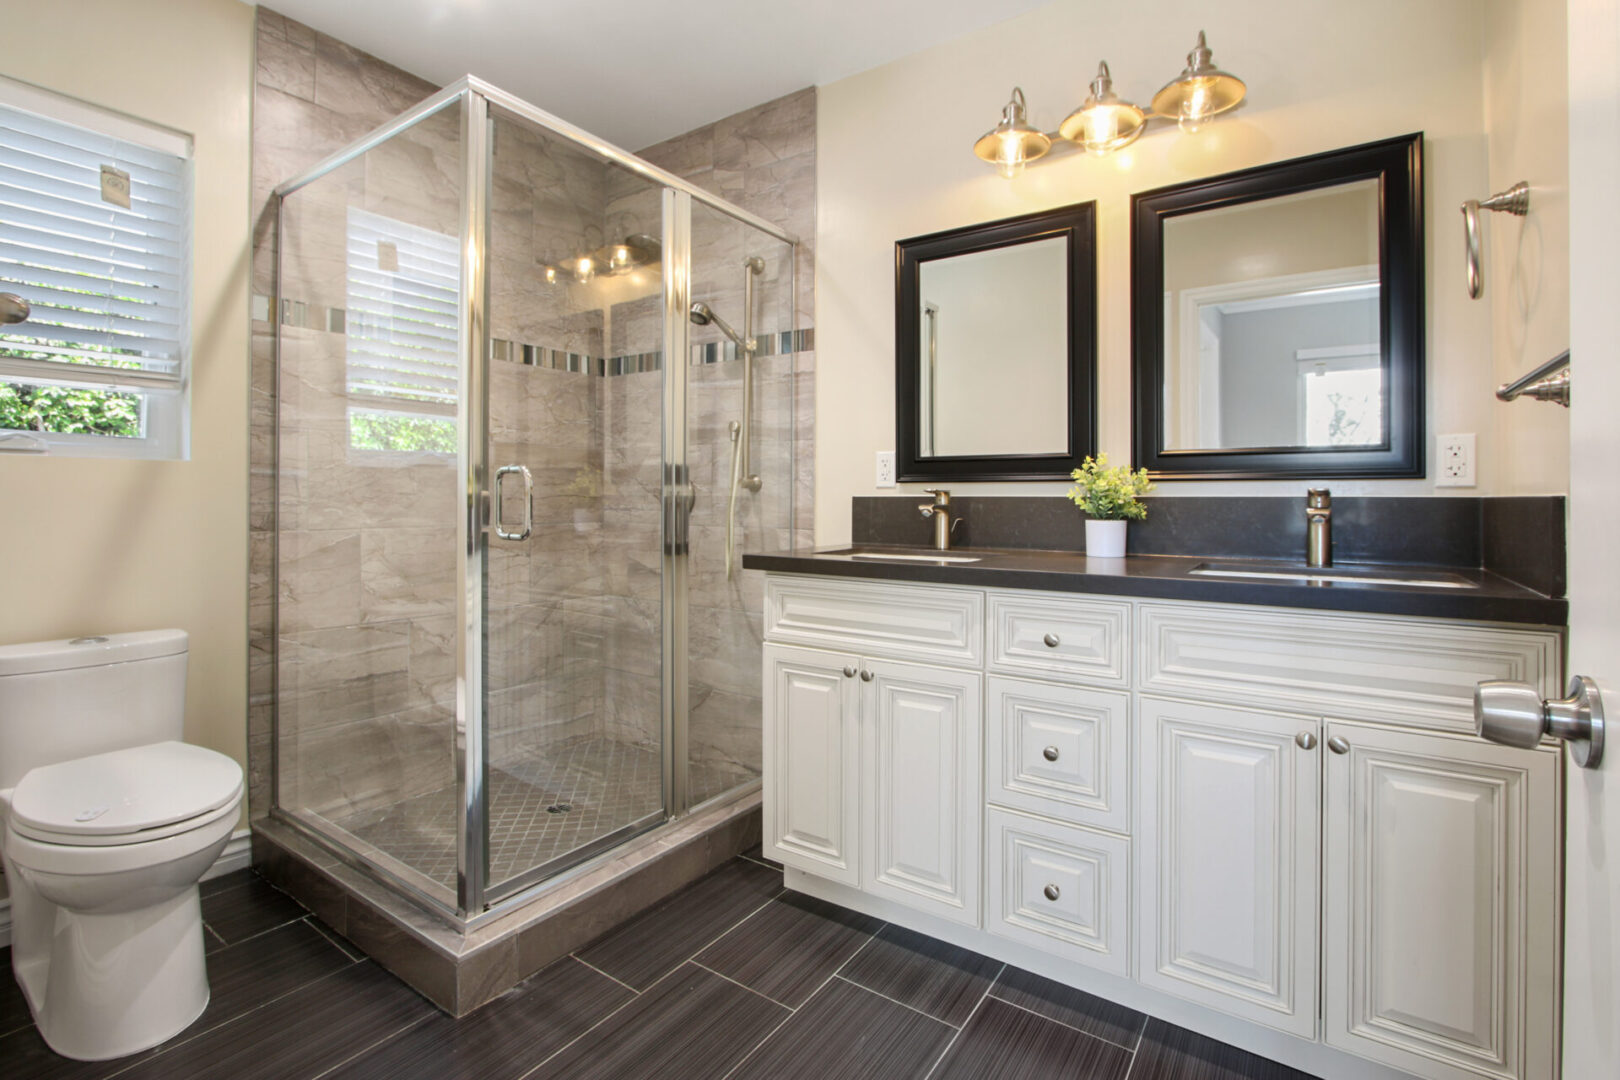 Bonwood bathroom